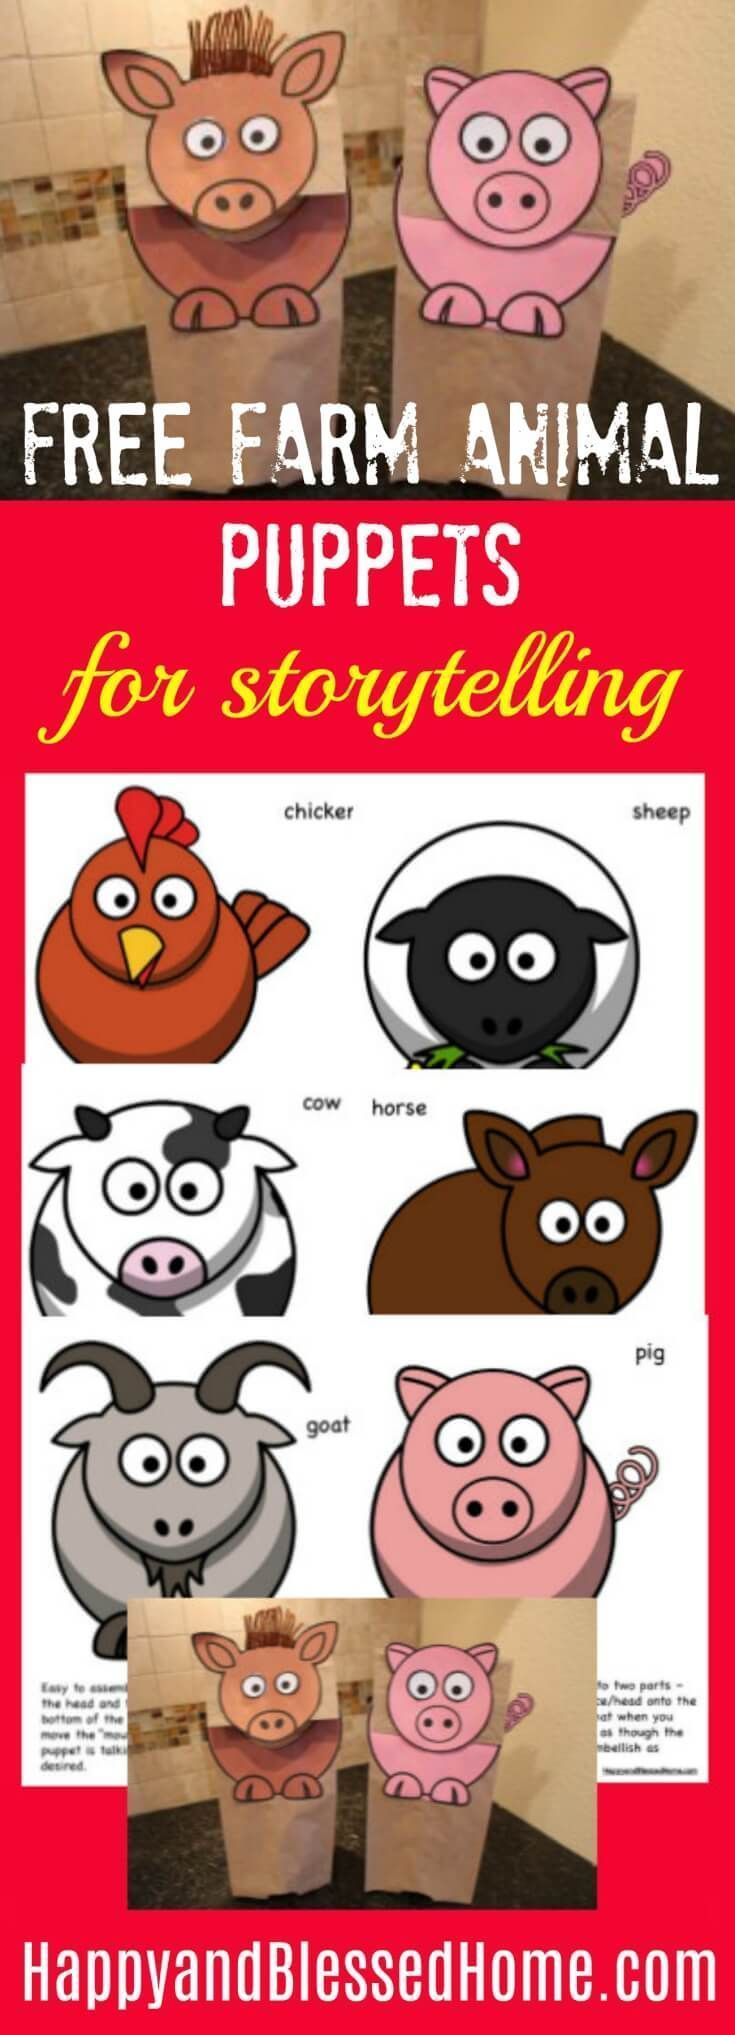 Download FREE Farm Animal Puppets Farm animals games